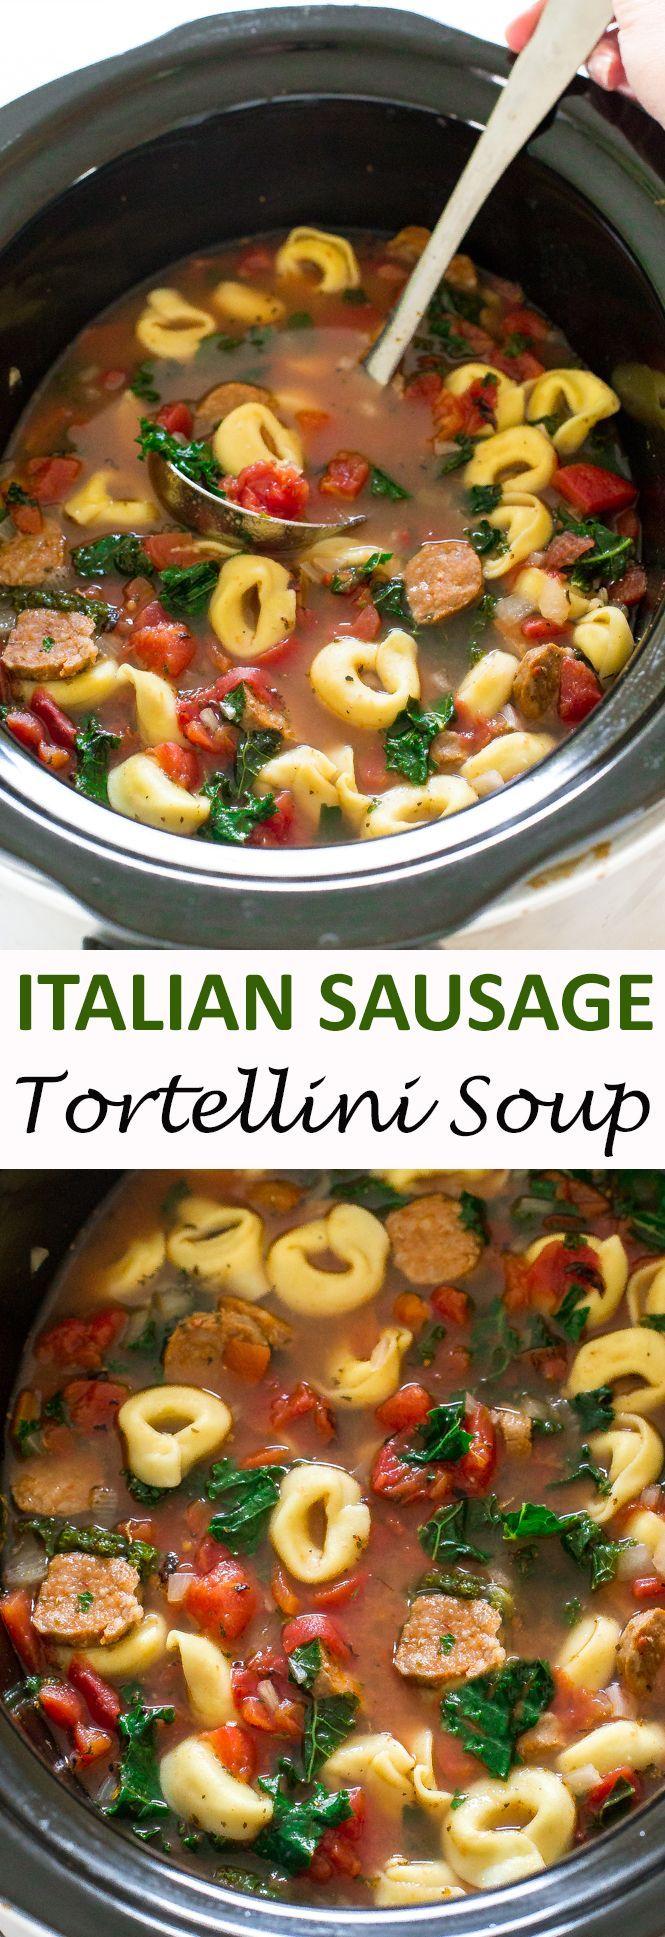 Sausage Tortellini Soup on Pinterest | Sausage tortellini, Tortellini ...